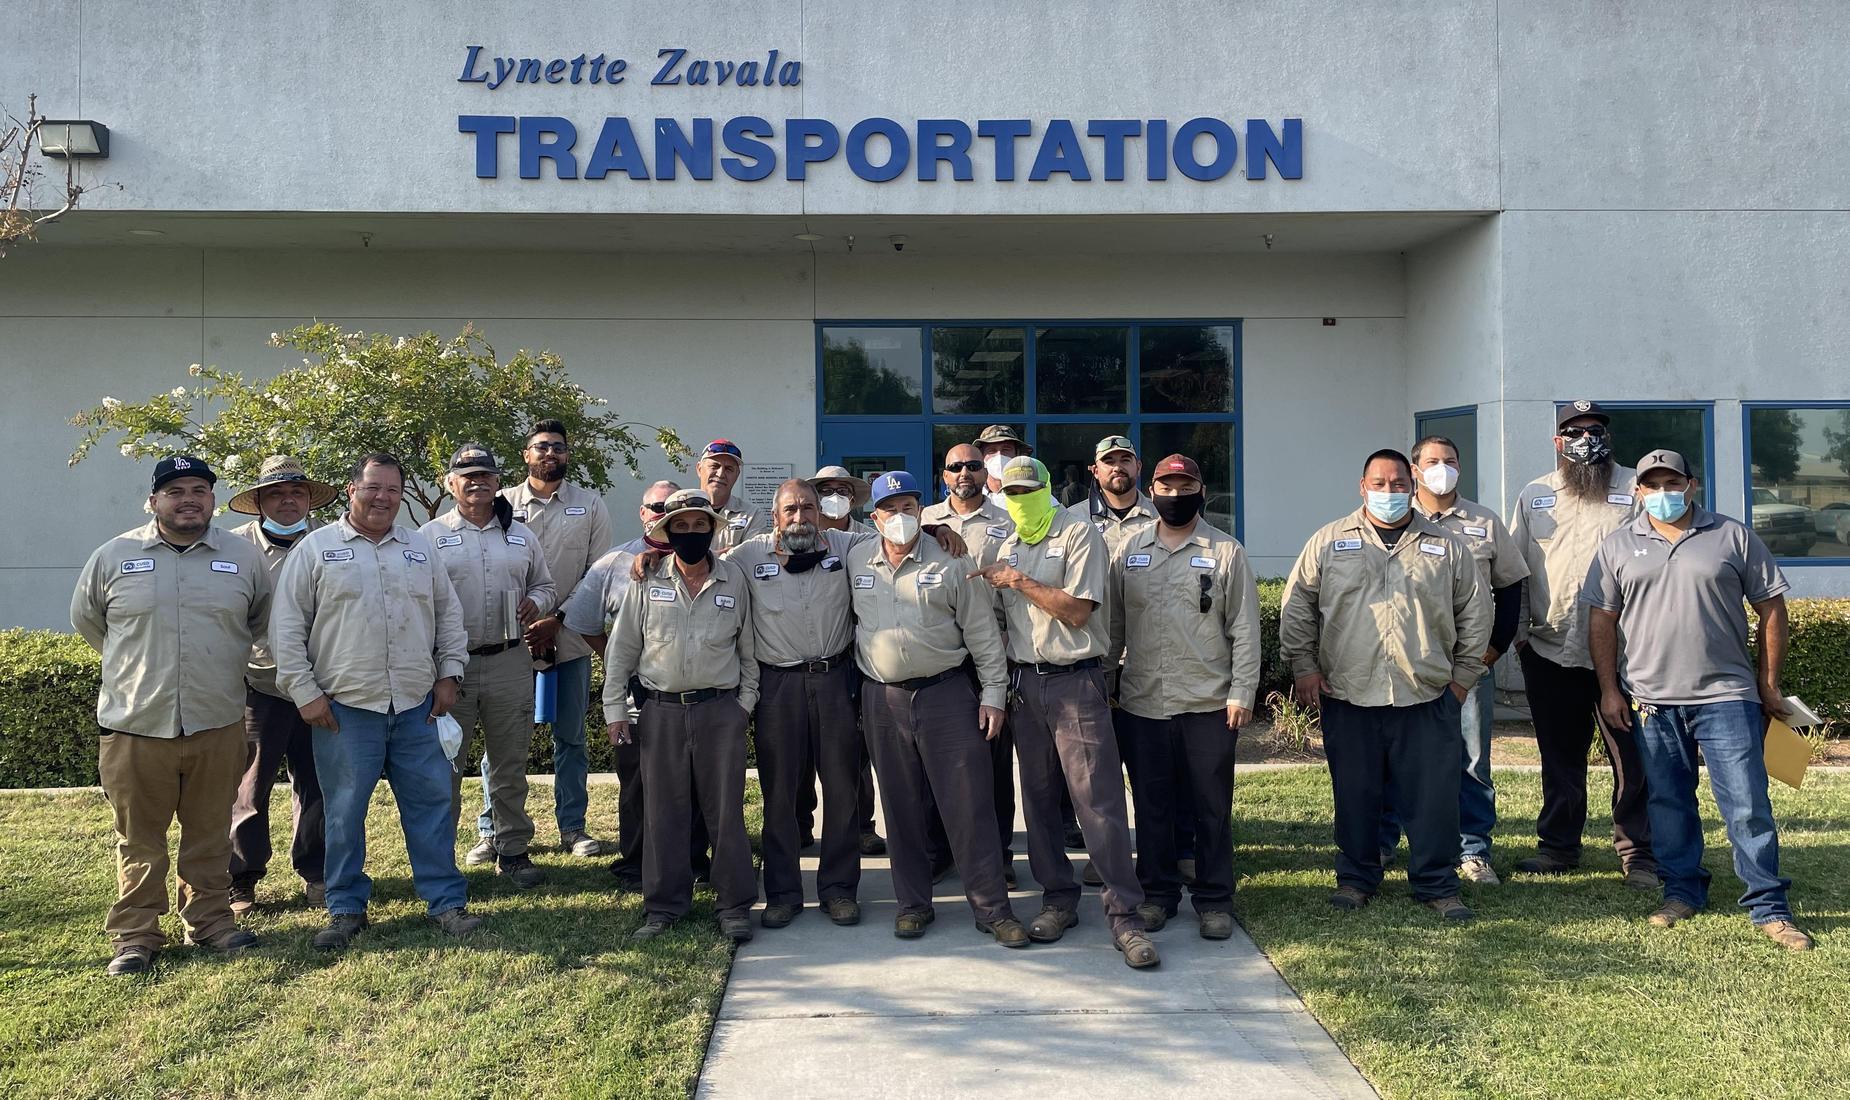 Custodial & Maintenance staff